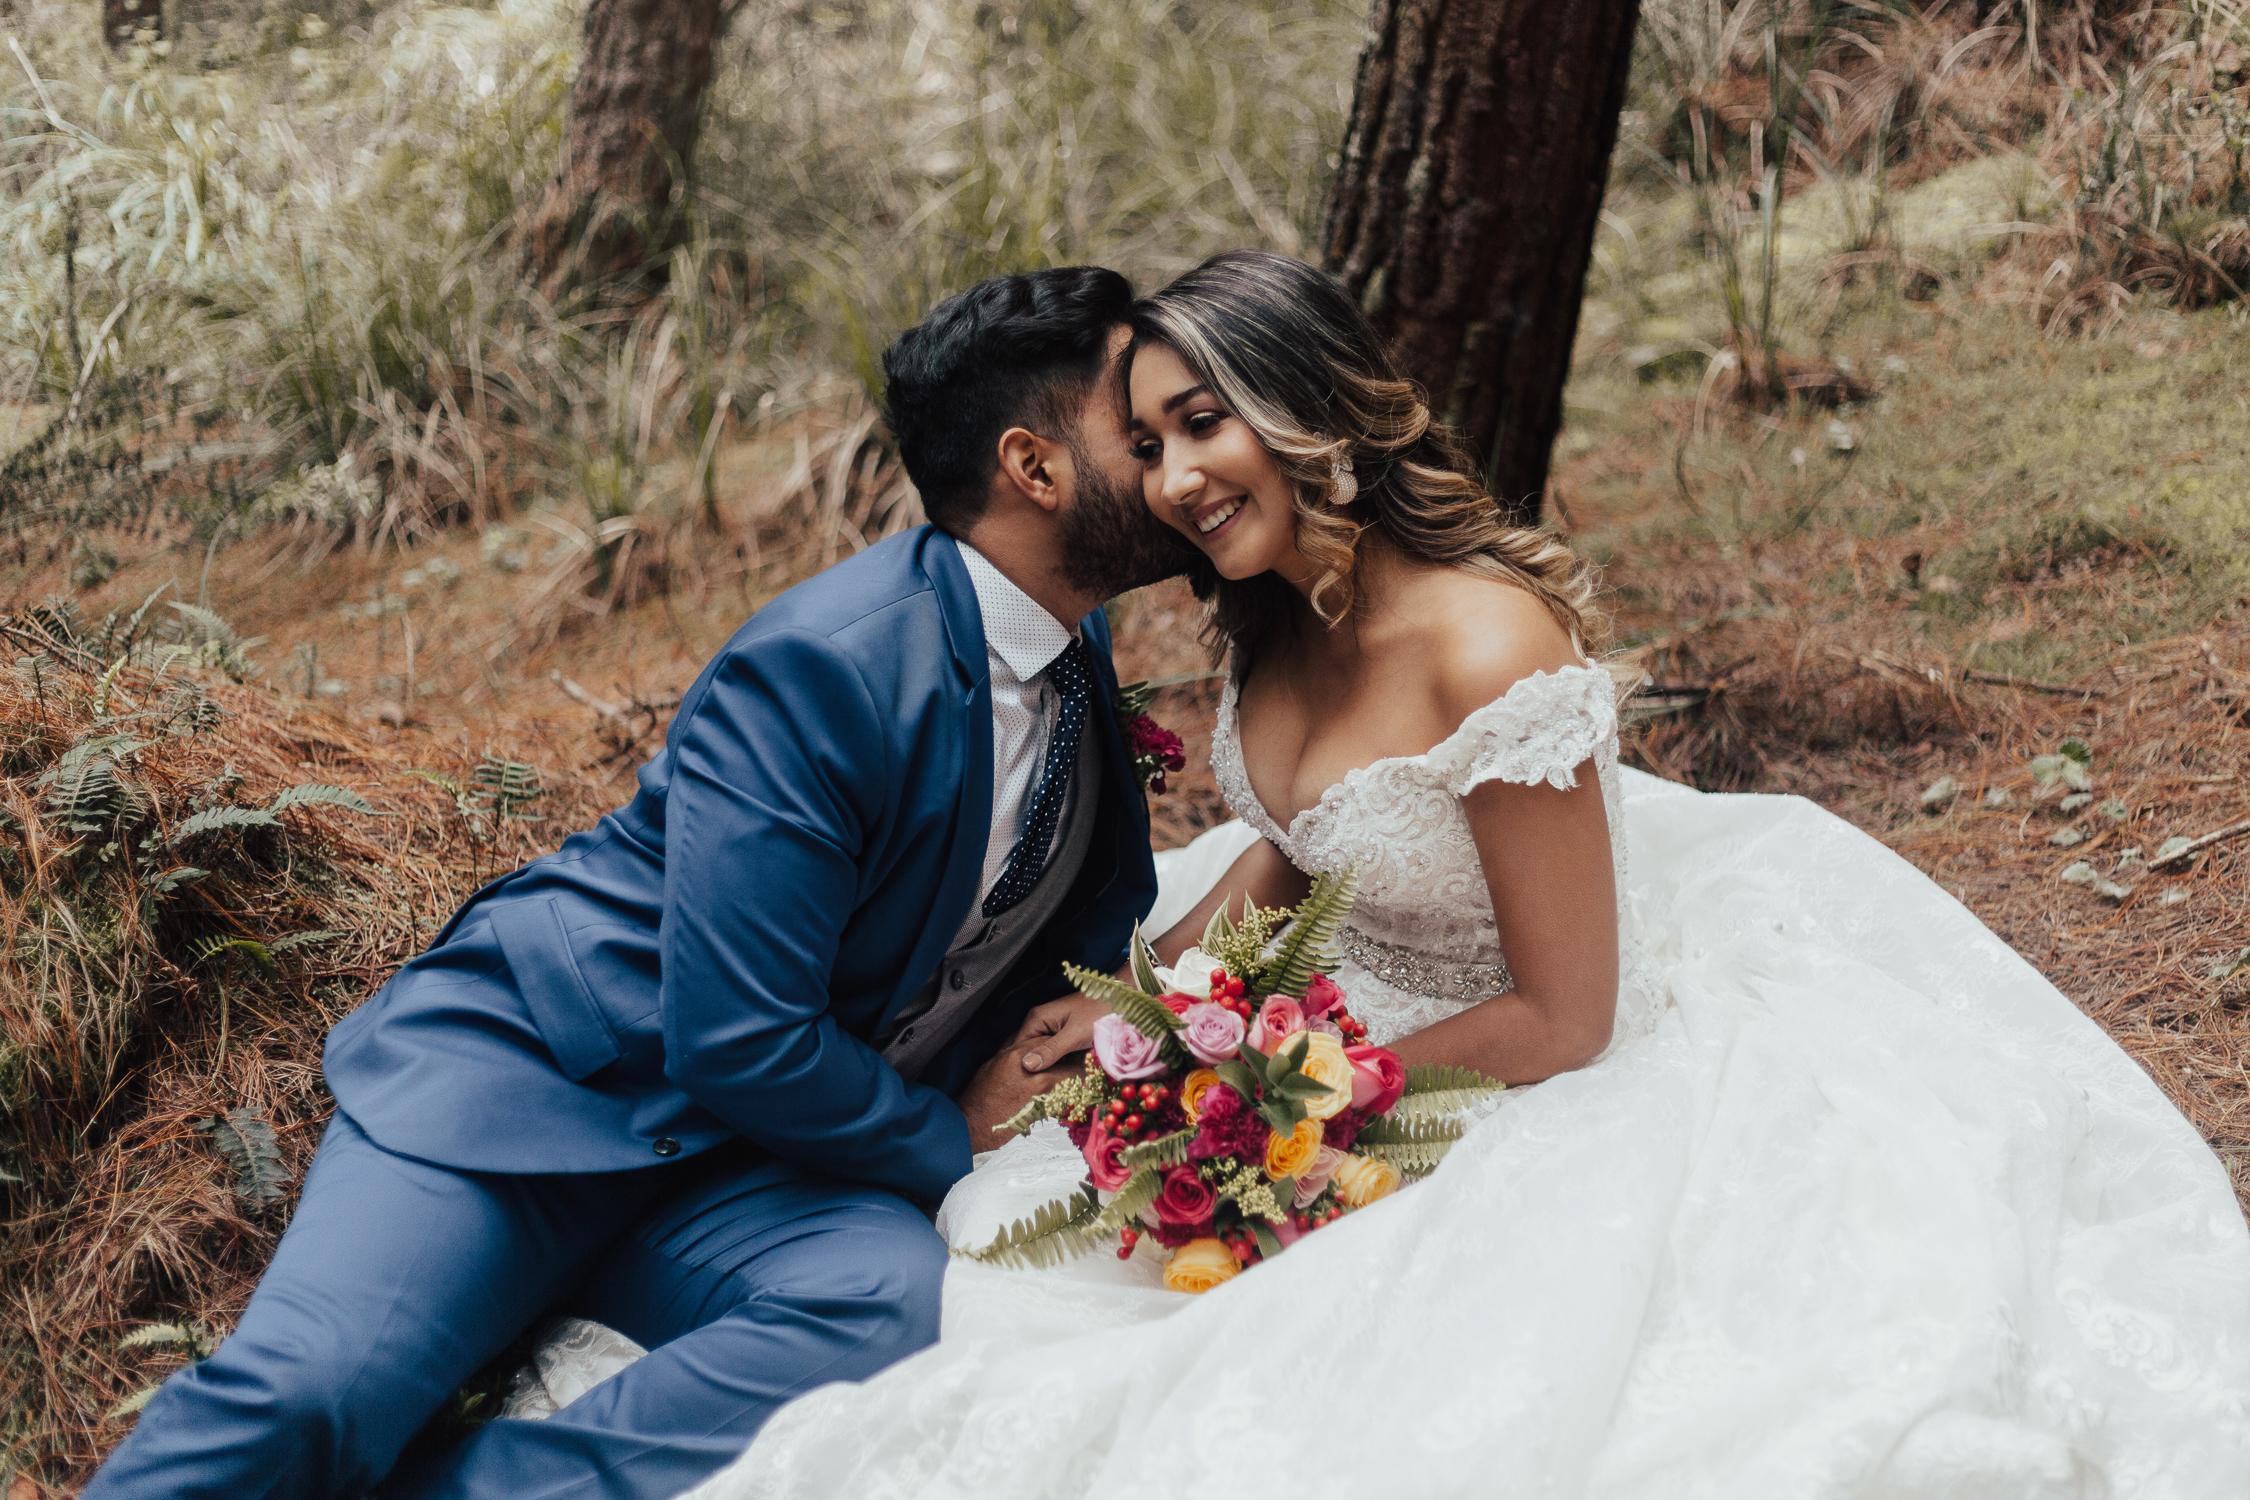 Michelle-Agurto-Fotografia-Bodas-Destination-Wedding-Photographer-Ecuador-Sesion-Johanna-Eduardo-48.JPG